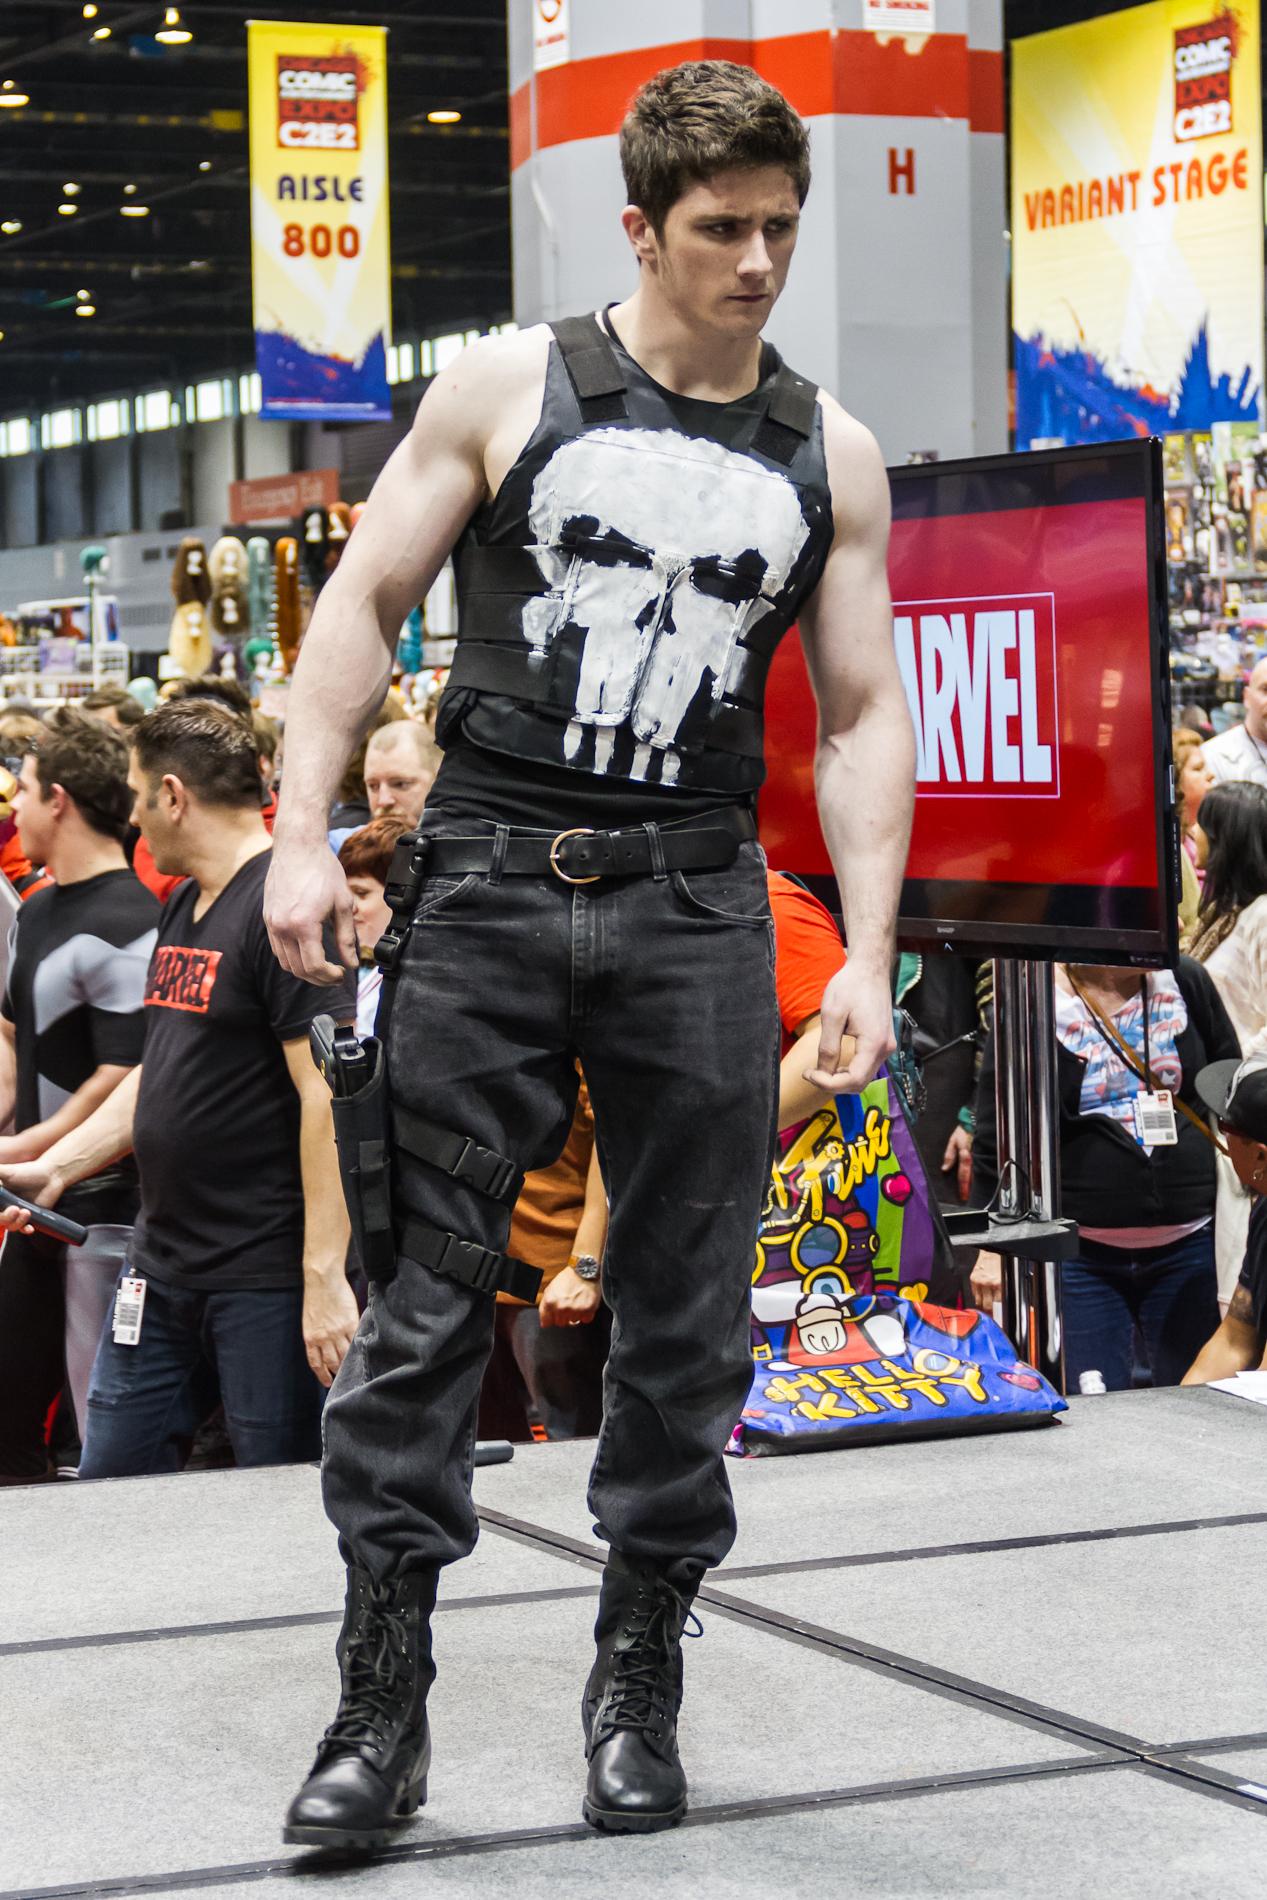 File:Punisher at C2E2 2012 Marvel Costume contest.jpg